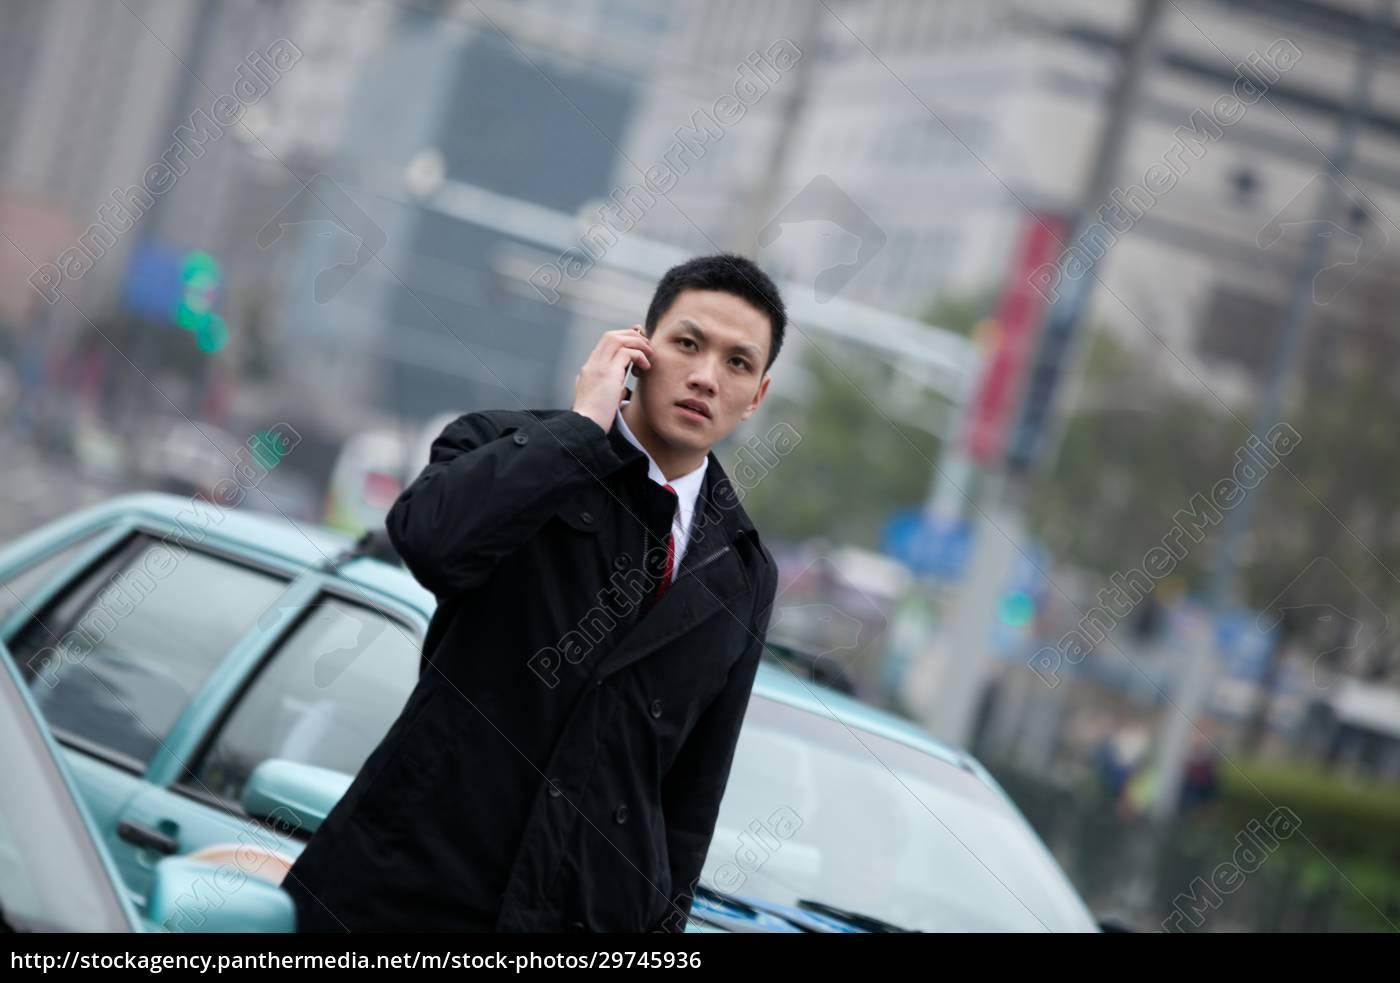 oriental, traffic, adult, communication, professionelle, kleidung - 29745936